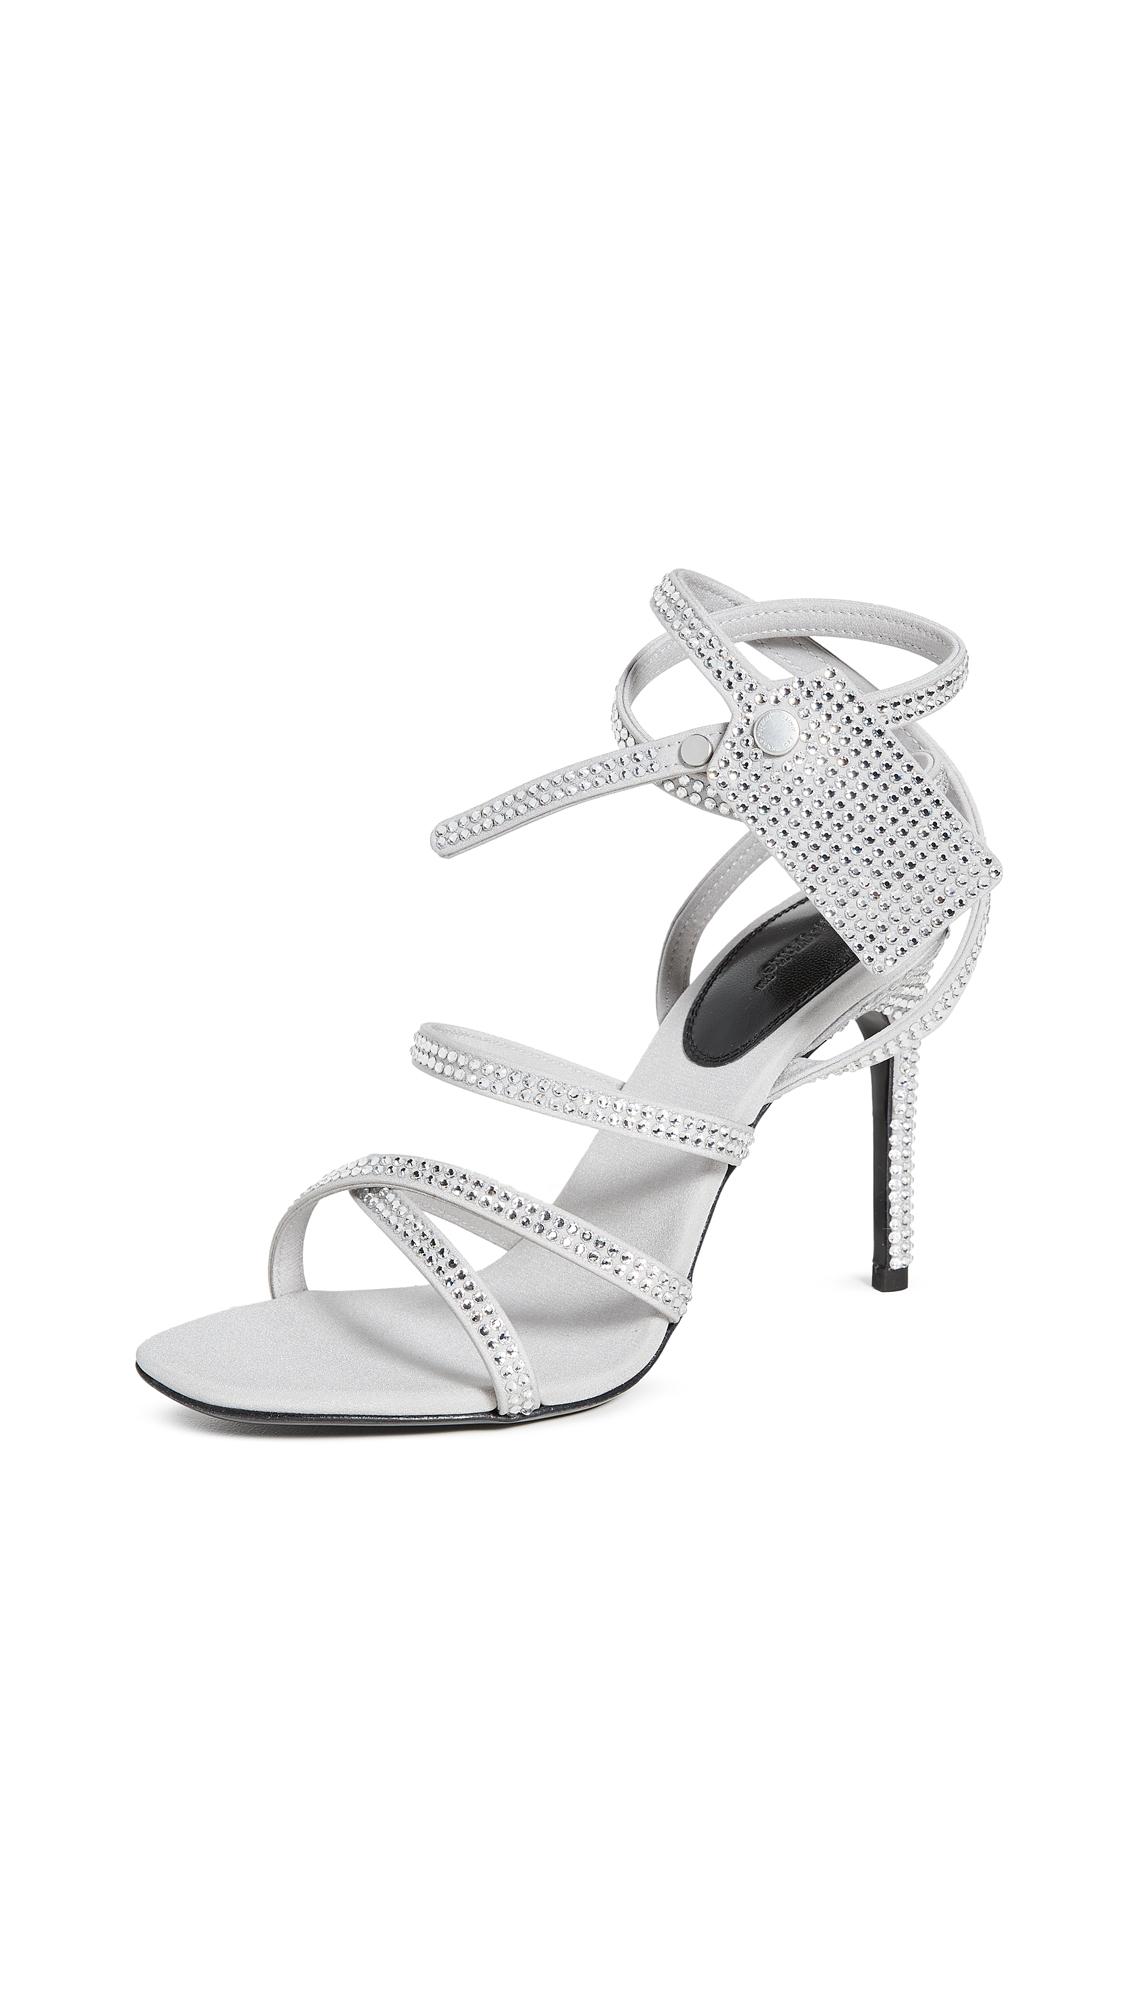 Buy Off-White Crystal Satin Zip Tie Sandals online, shop Off-White